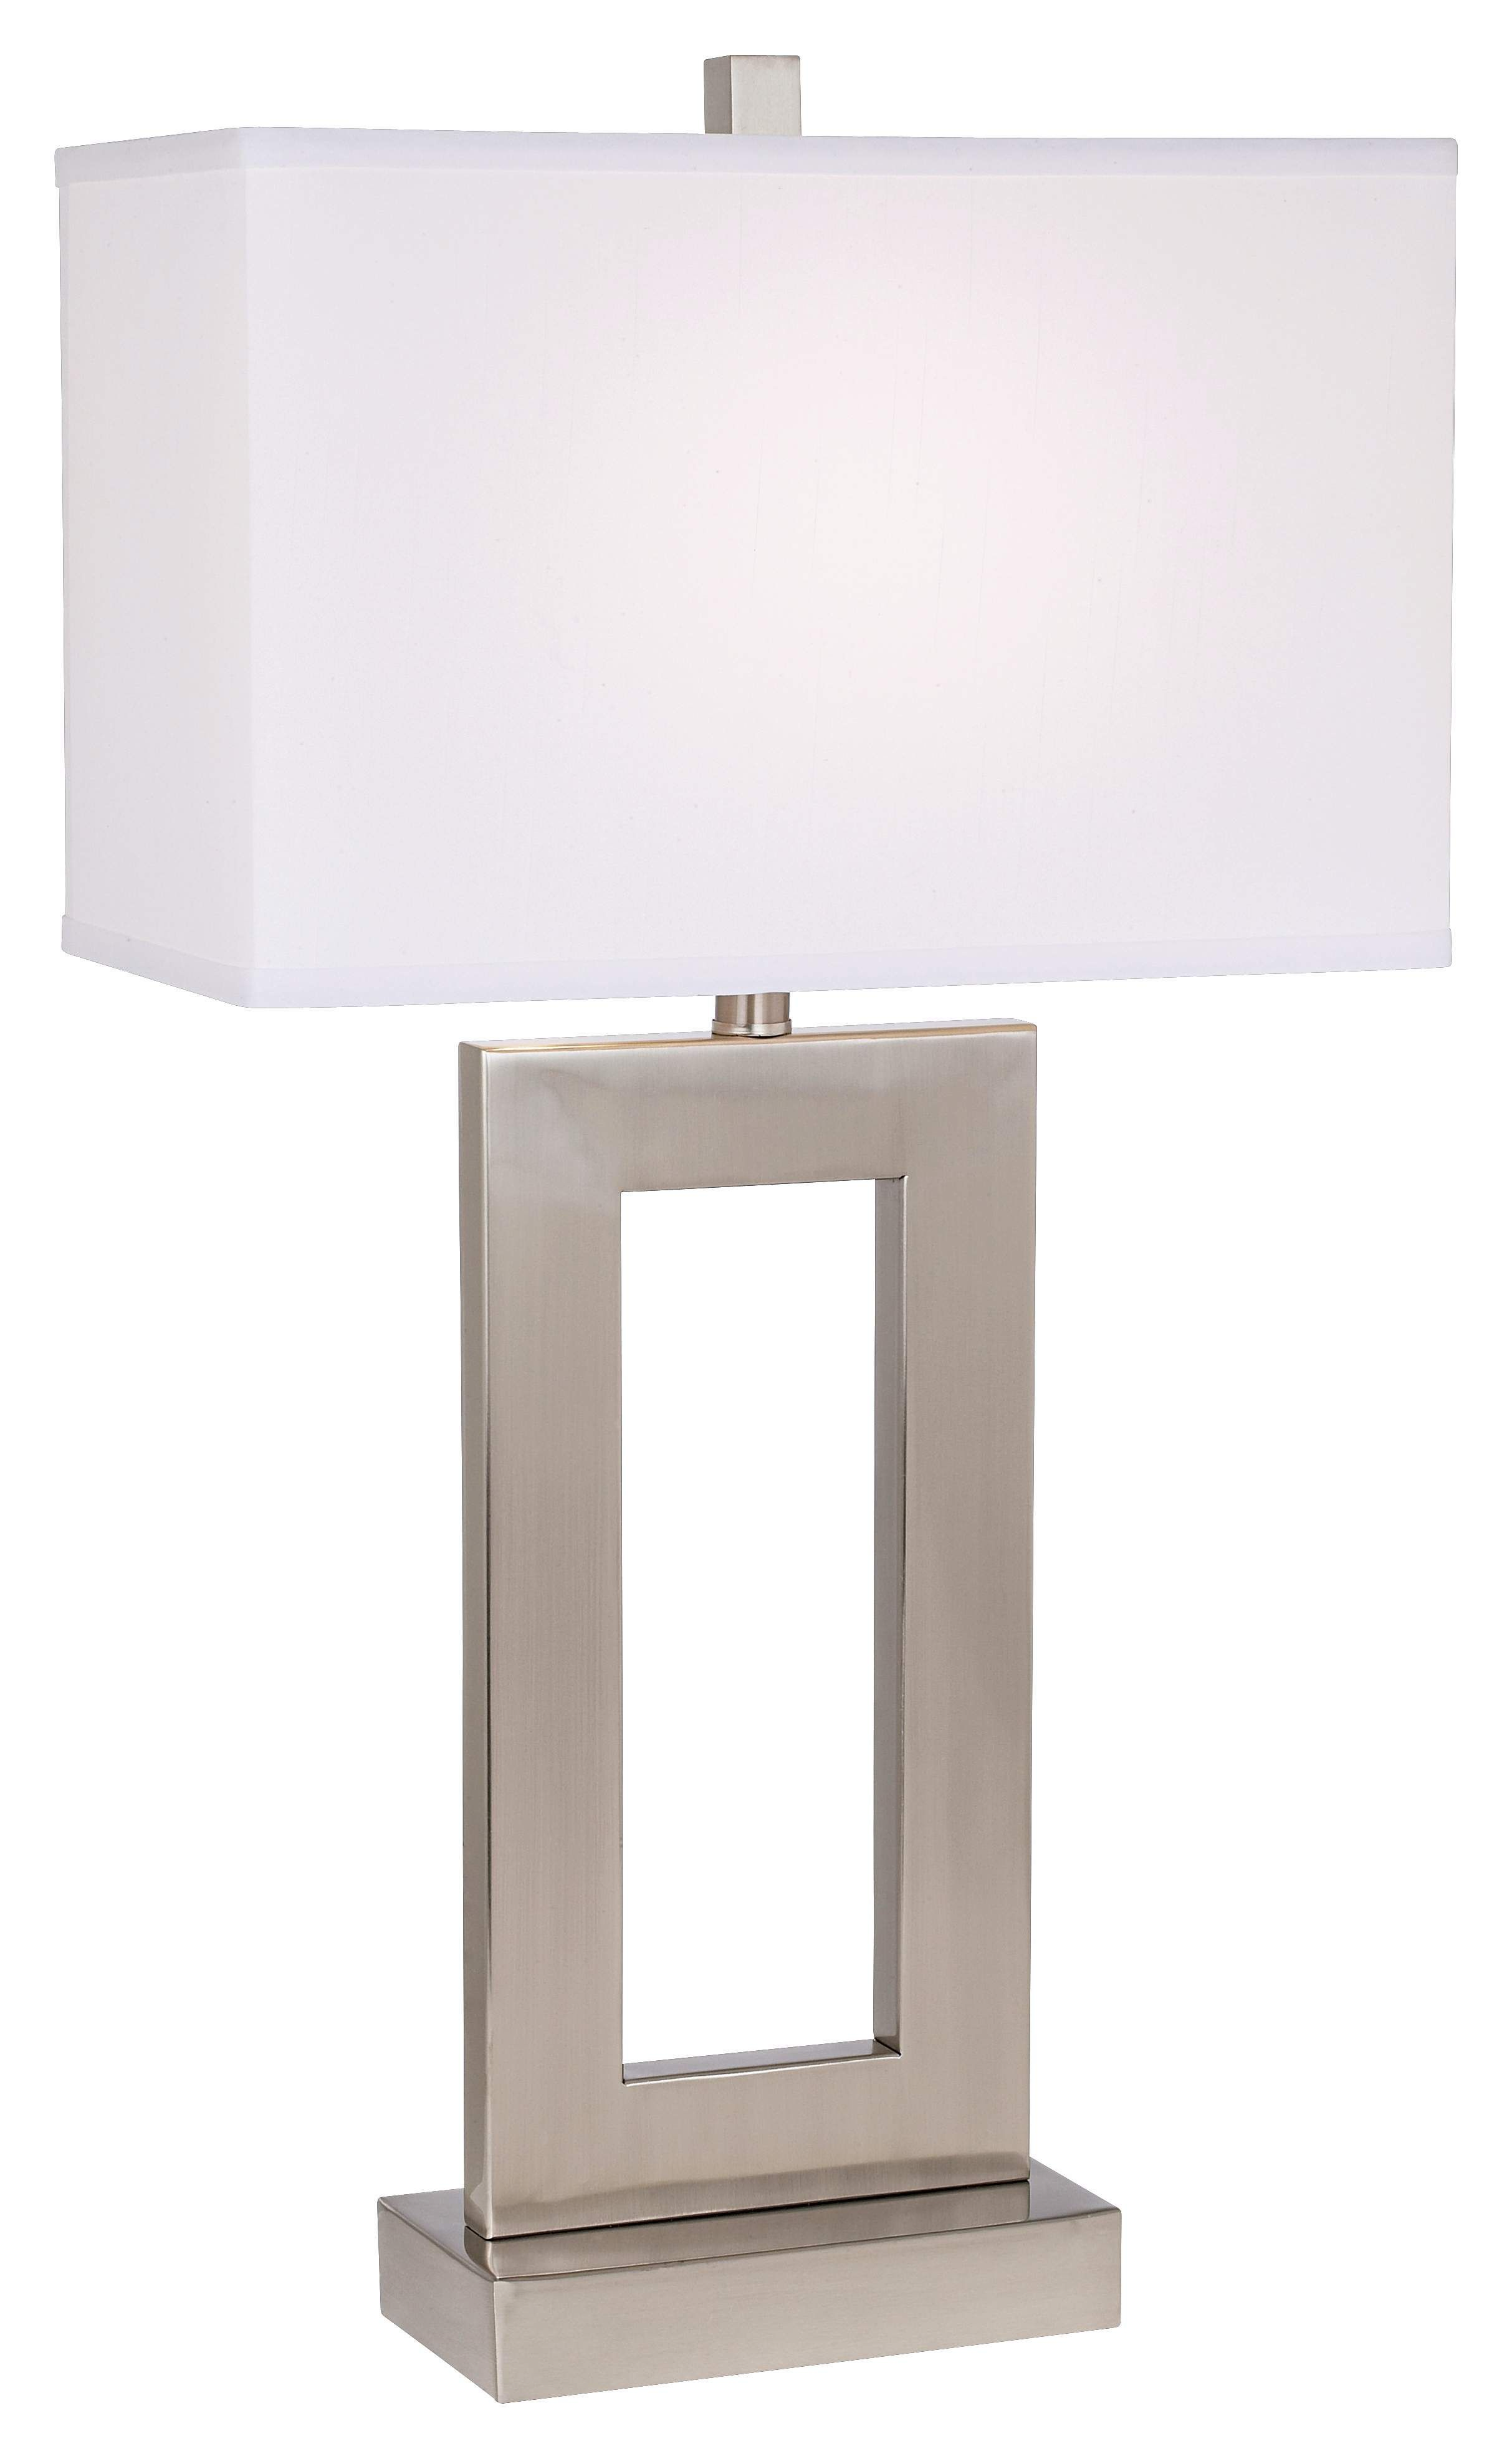 Brushed Steel Open Window Rectangular Table Lamp   #60238   LampsPlus.com